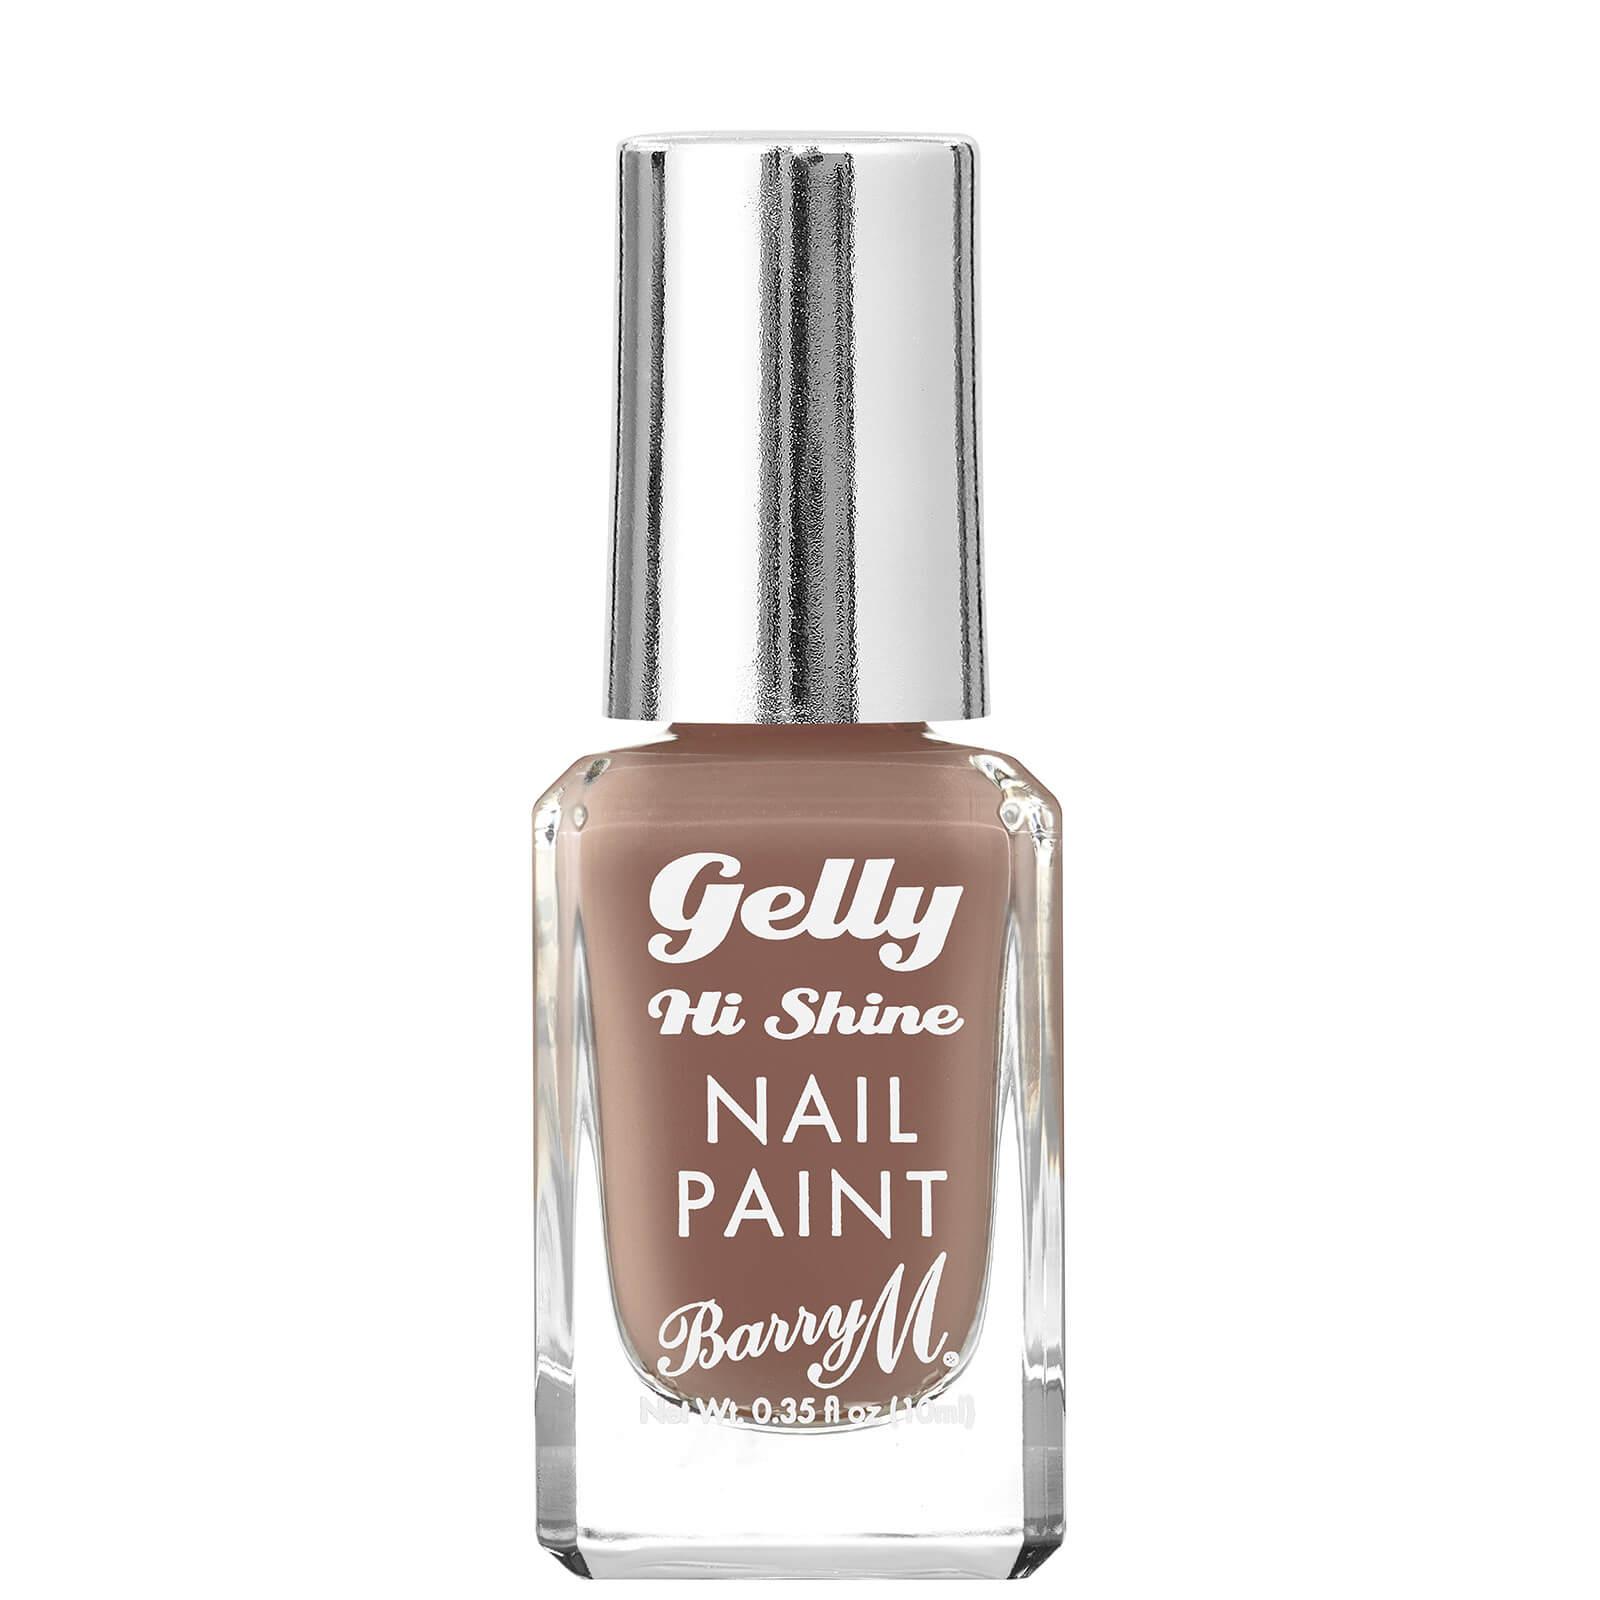 Купить Barry M Cosmetics Gelly Nail Paint 10ml (Various Shades) - Tiramisu